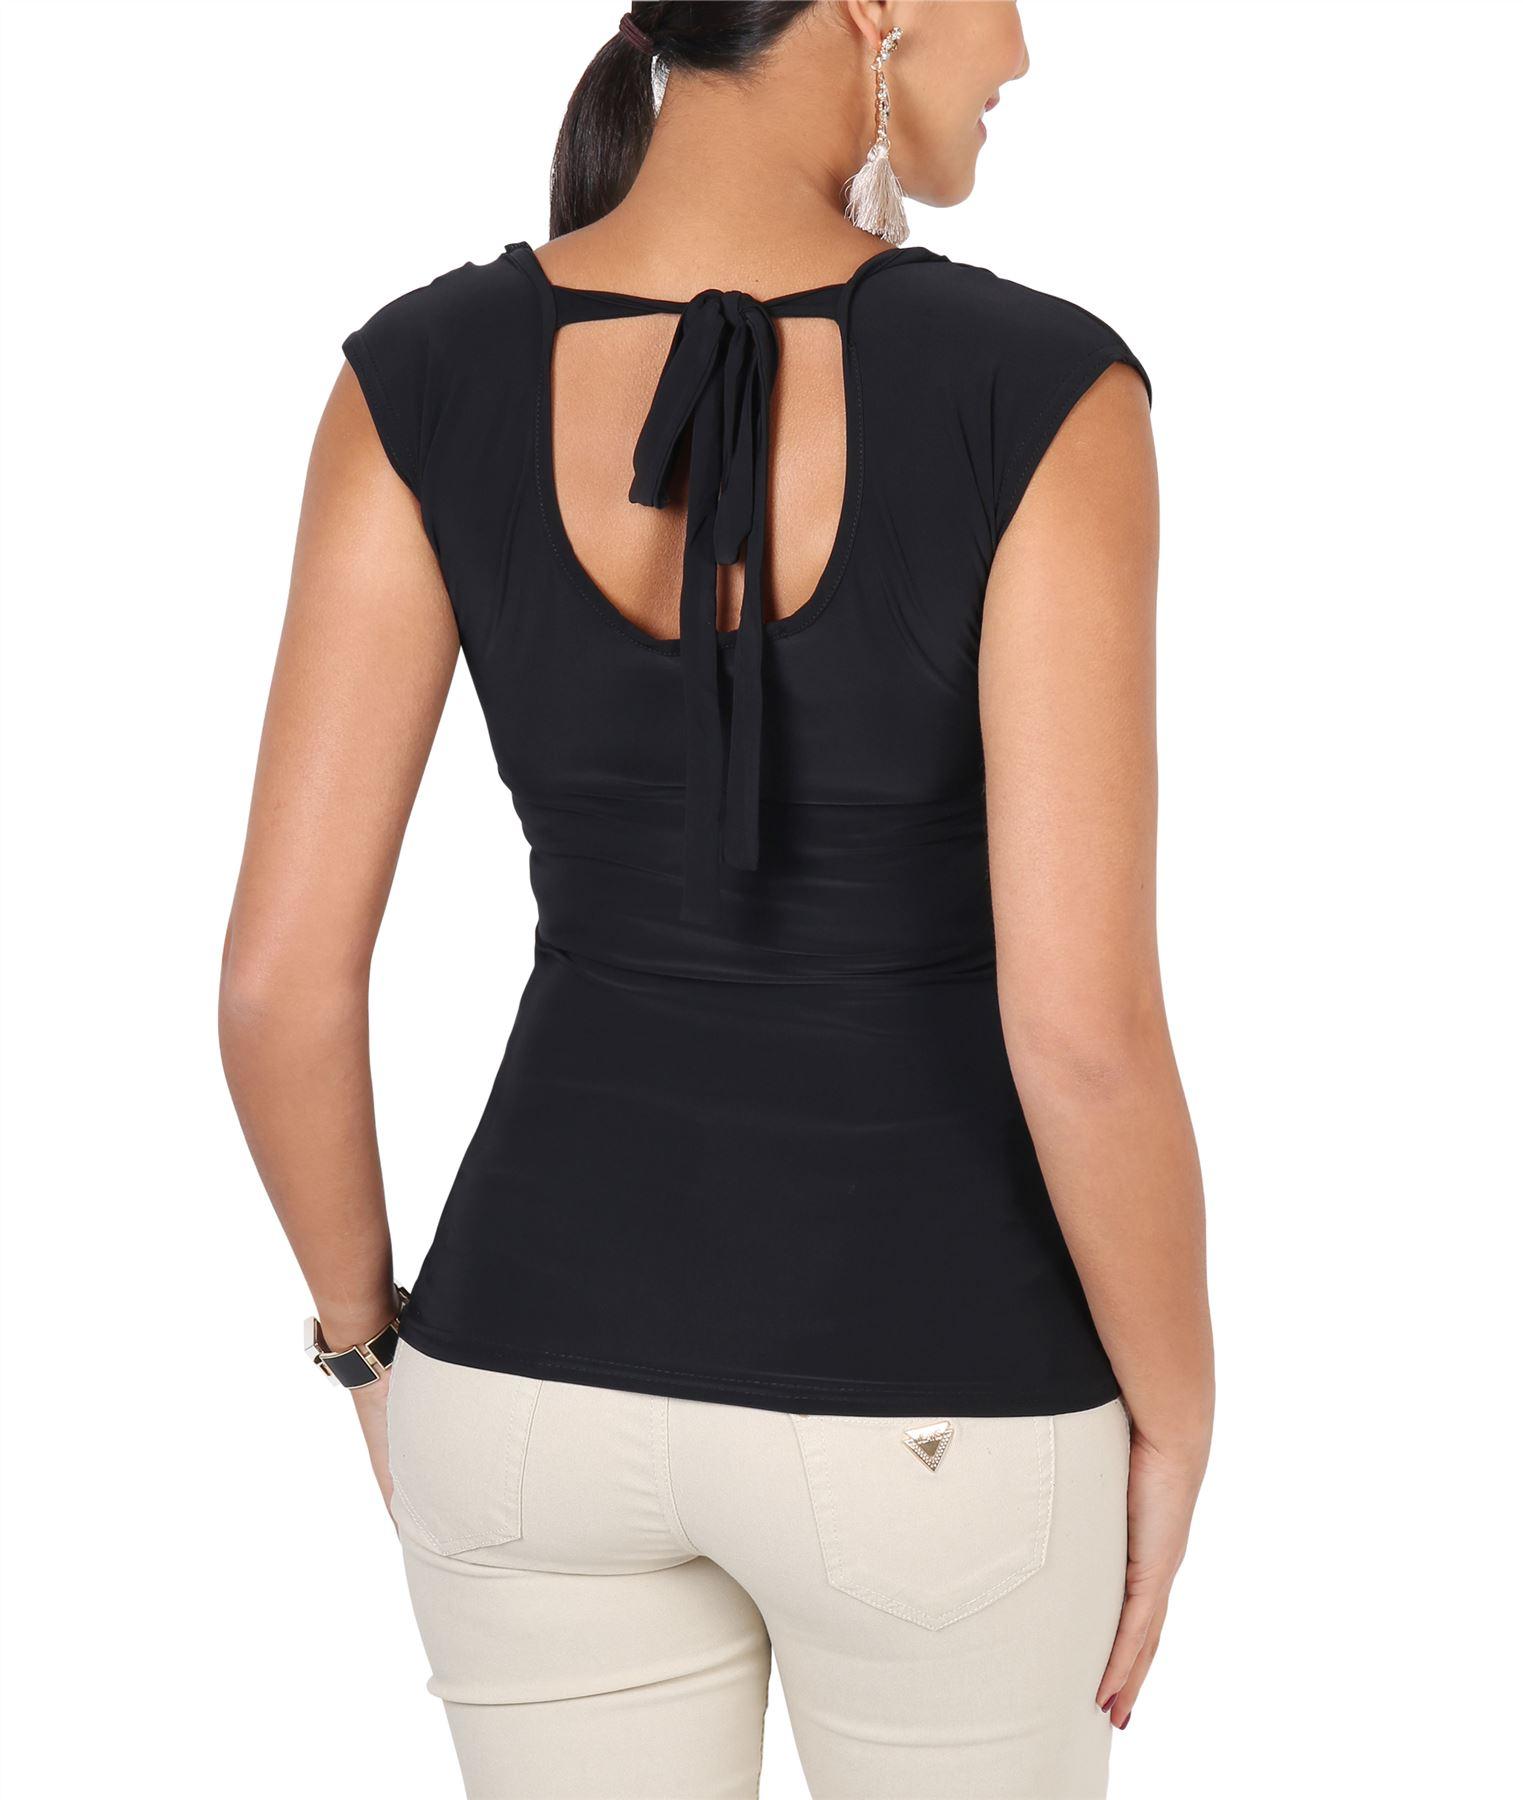 Femme-Top-Haut-Soiree-Decollete-N-ud-Dos-Chic-Sexy-Mode-Grande-Taille-Debardeur miniature 16